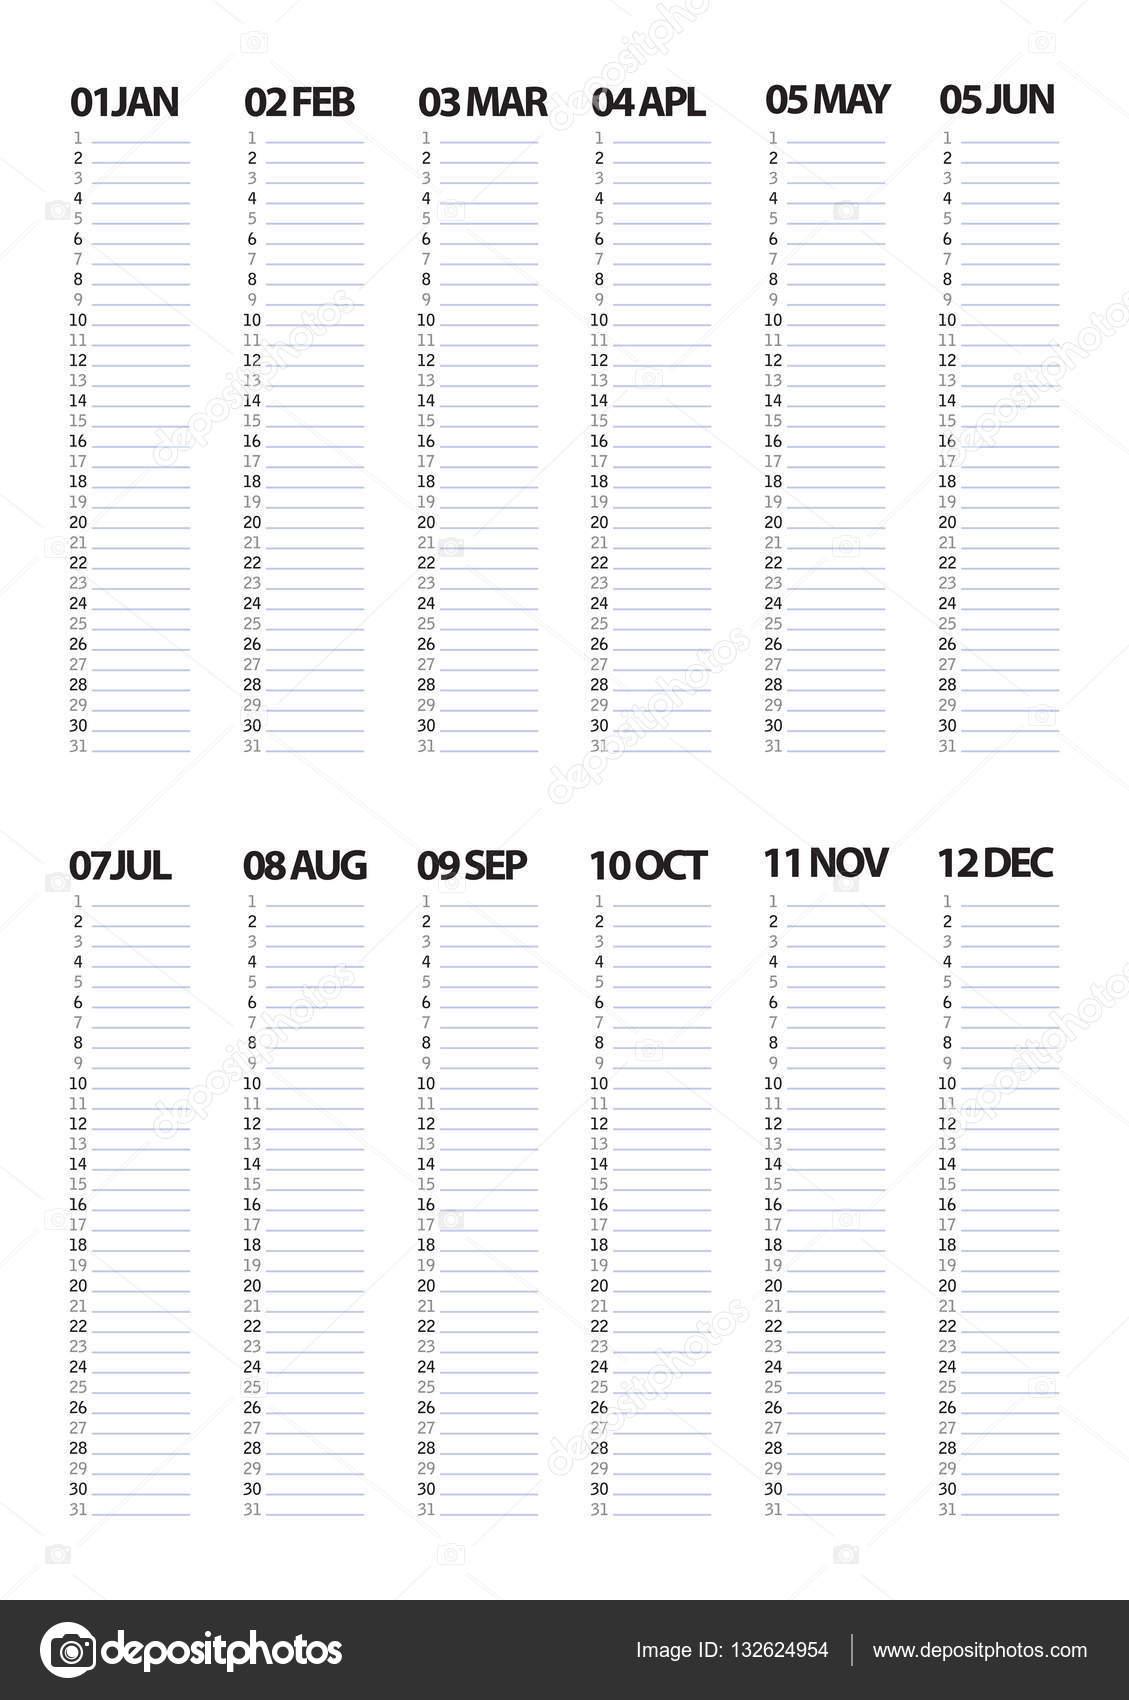 Jahr monatlich Hobel leere Vorlage — Stockvektor © melanjurga #132624954